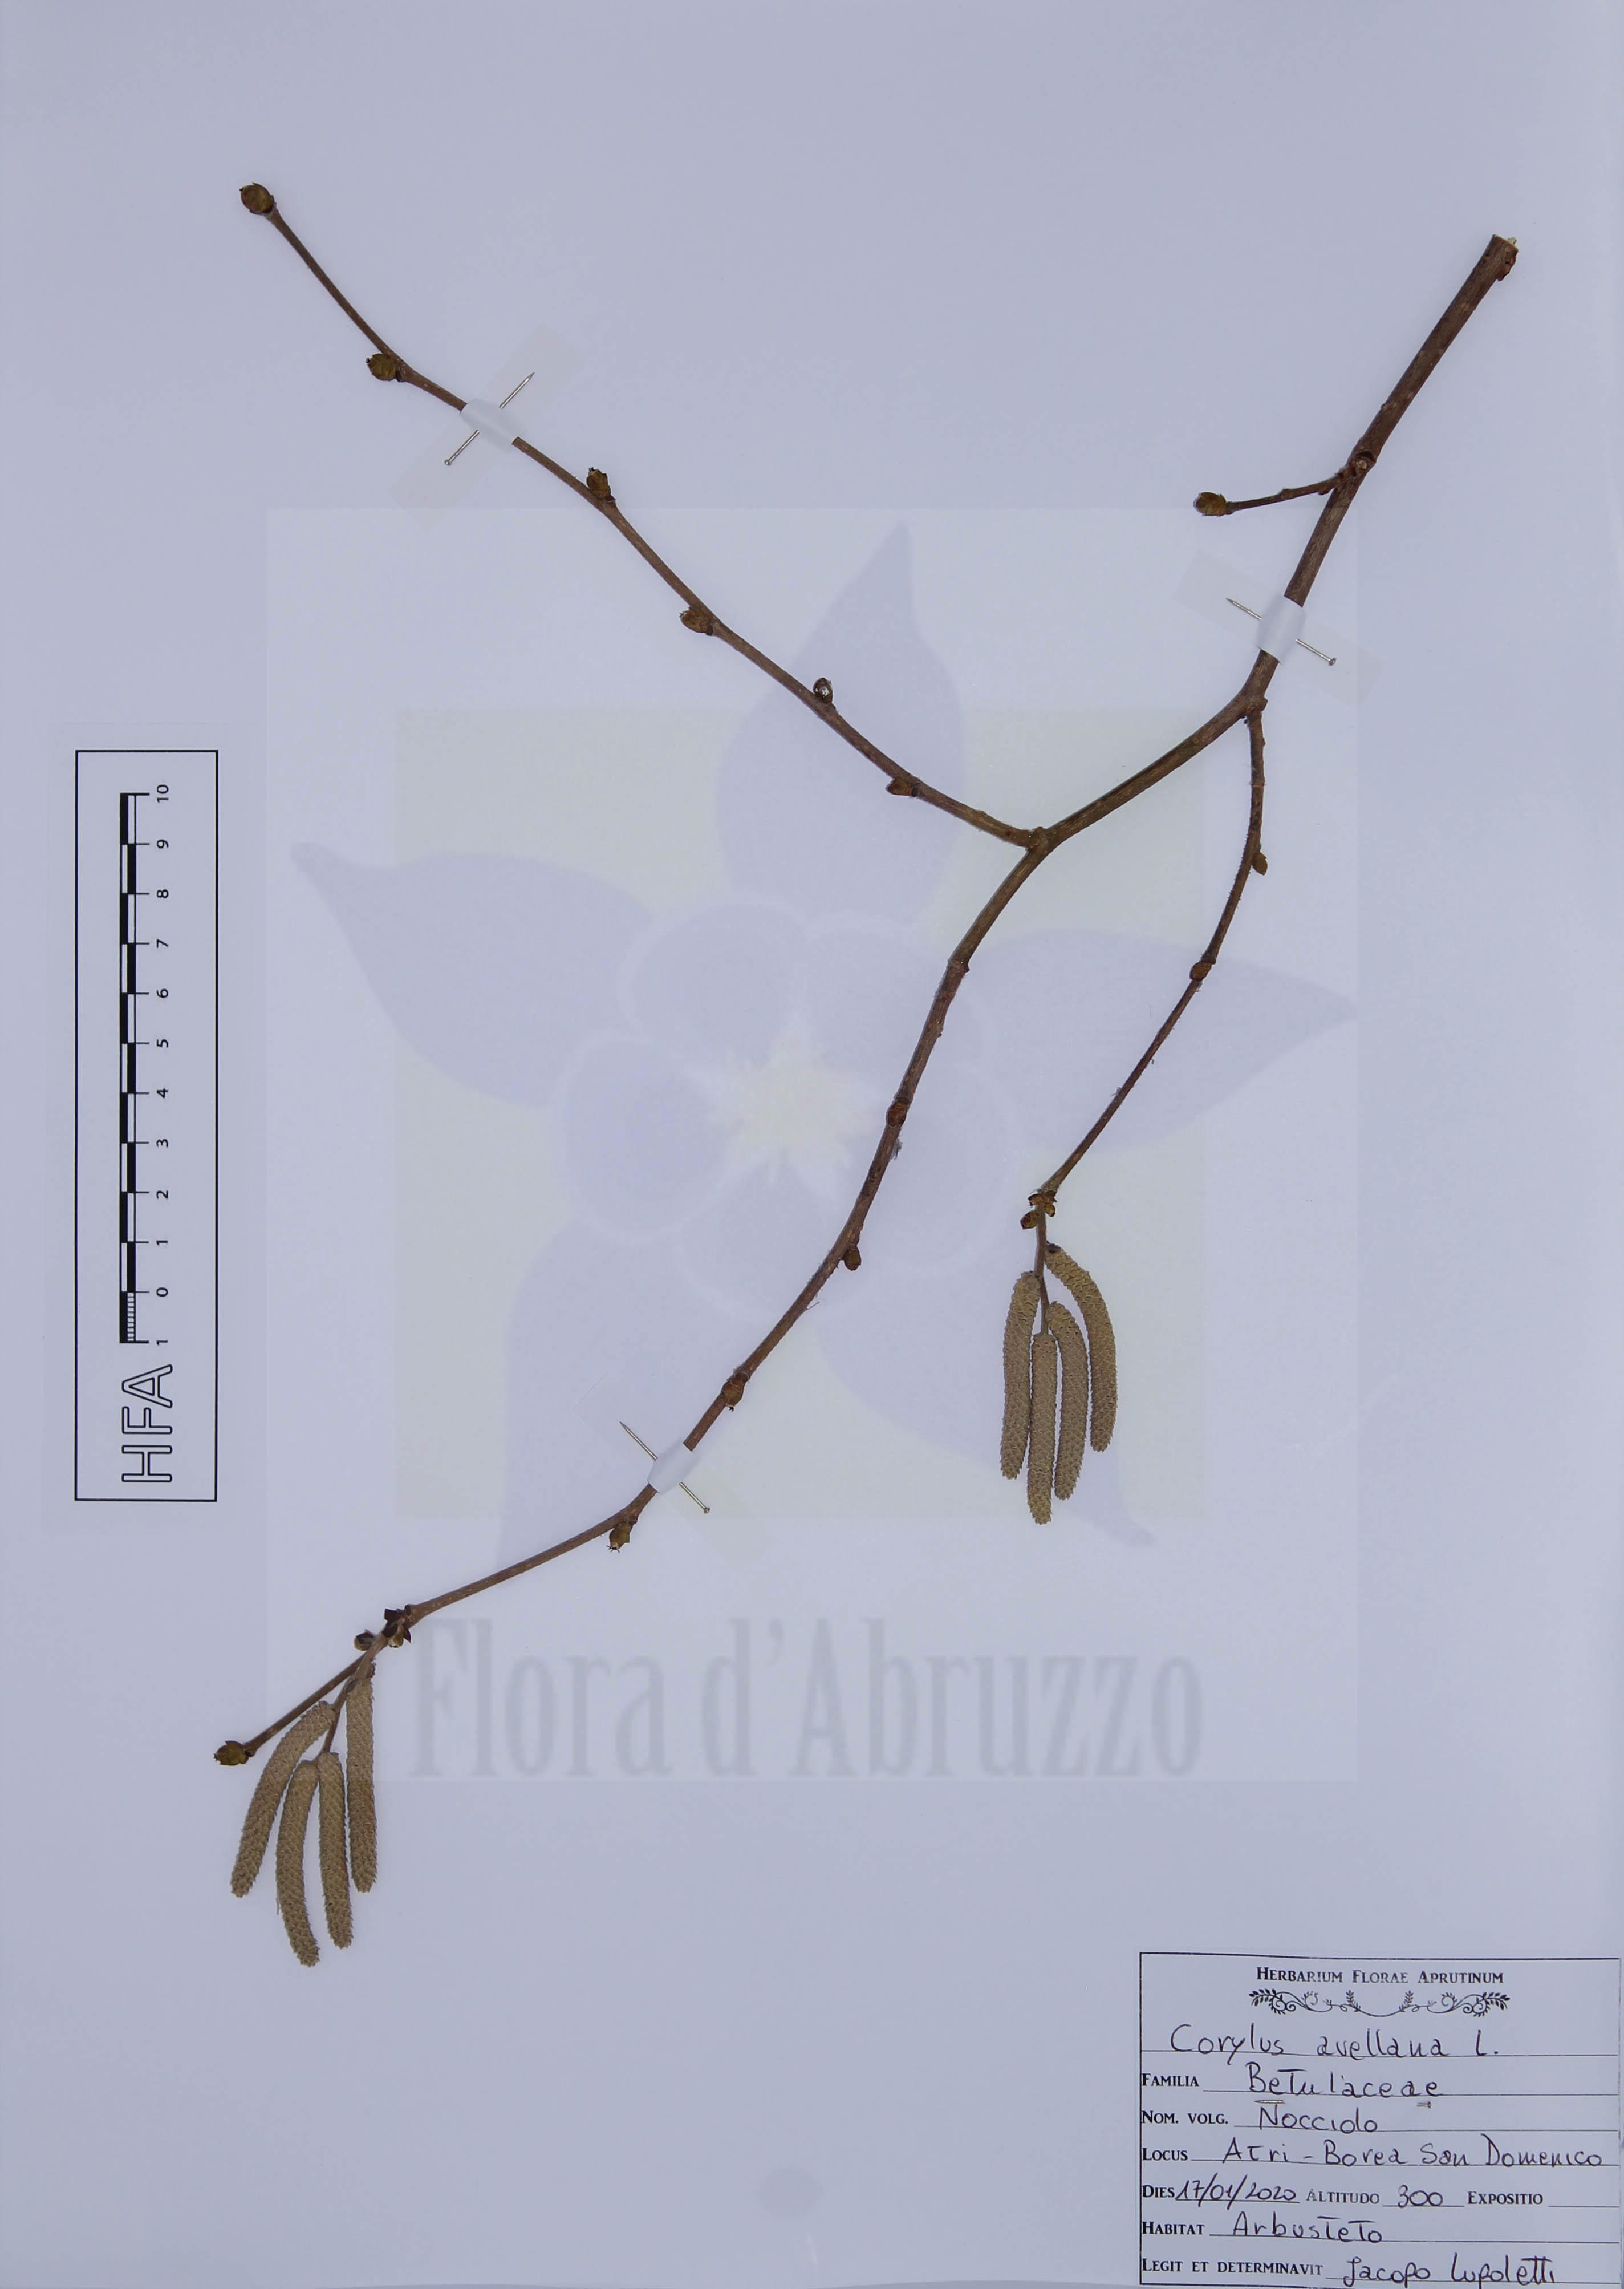 Corylus avellana L.